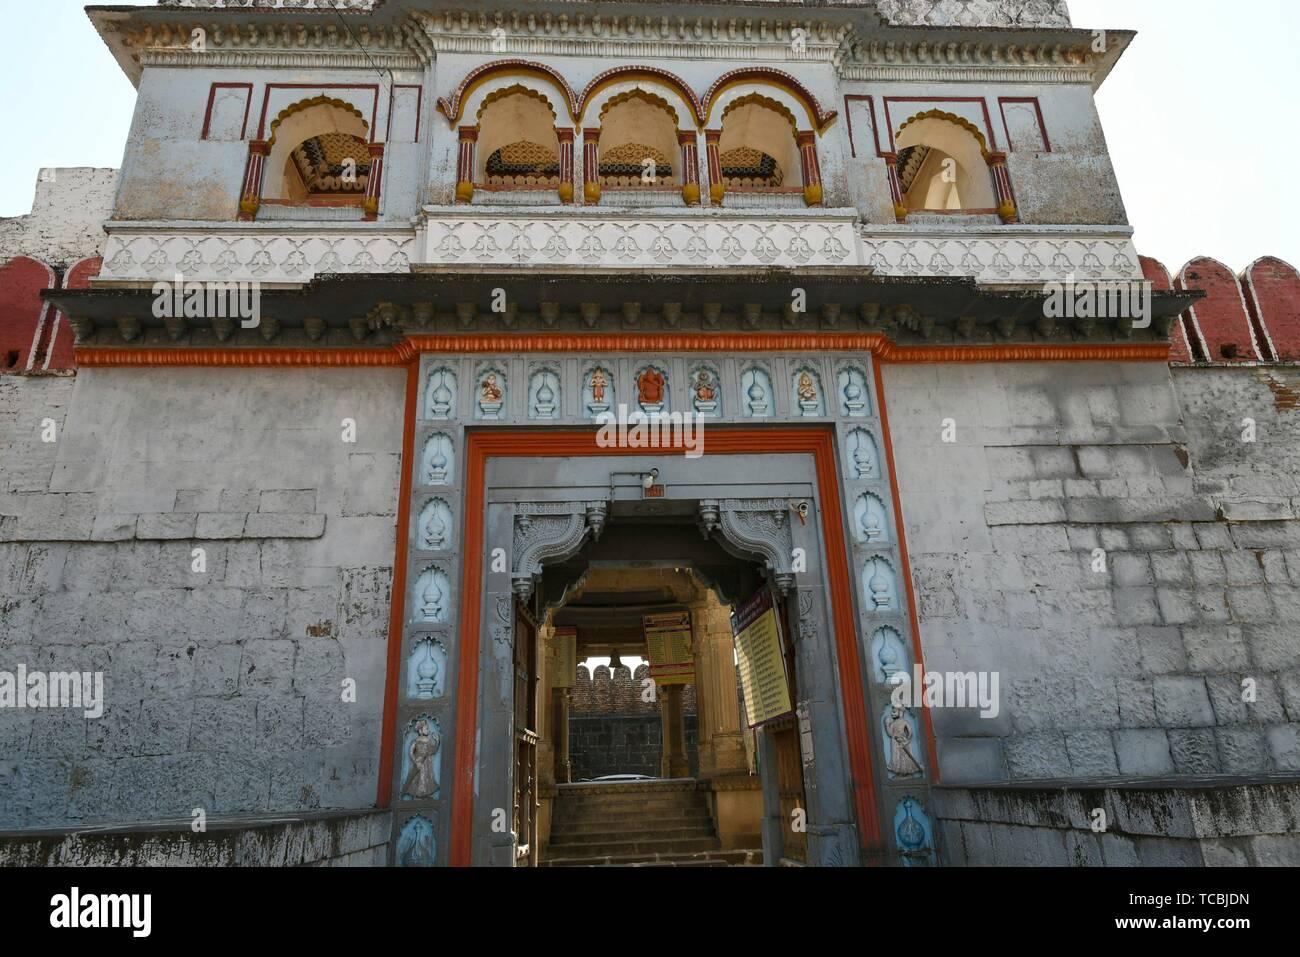 Stone masonry fortified wall and gate at Vitthal Temple, Palashi, Parner, Ahmednagar. - Stock Image